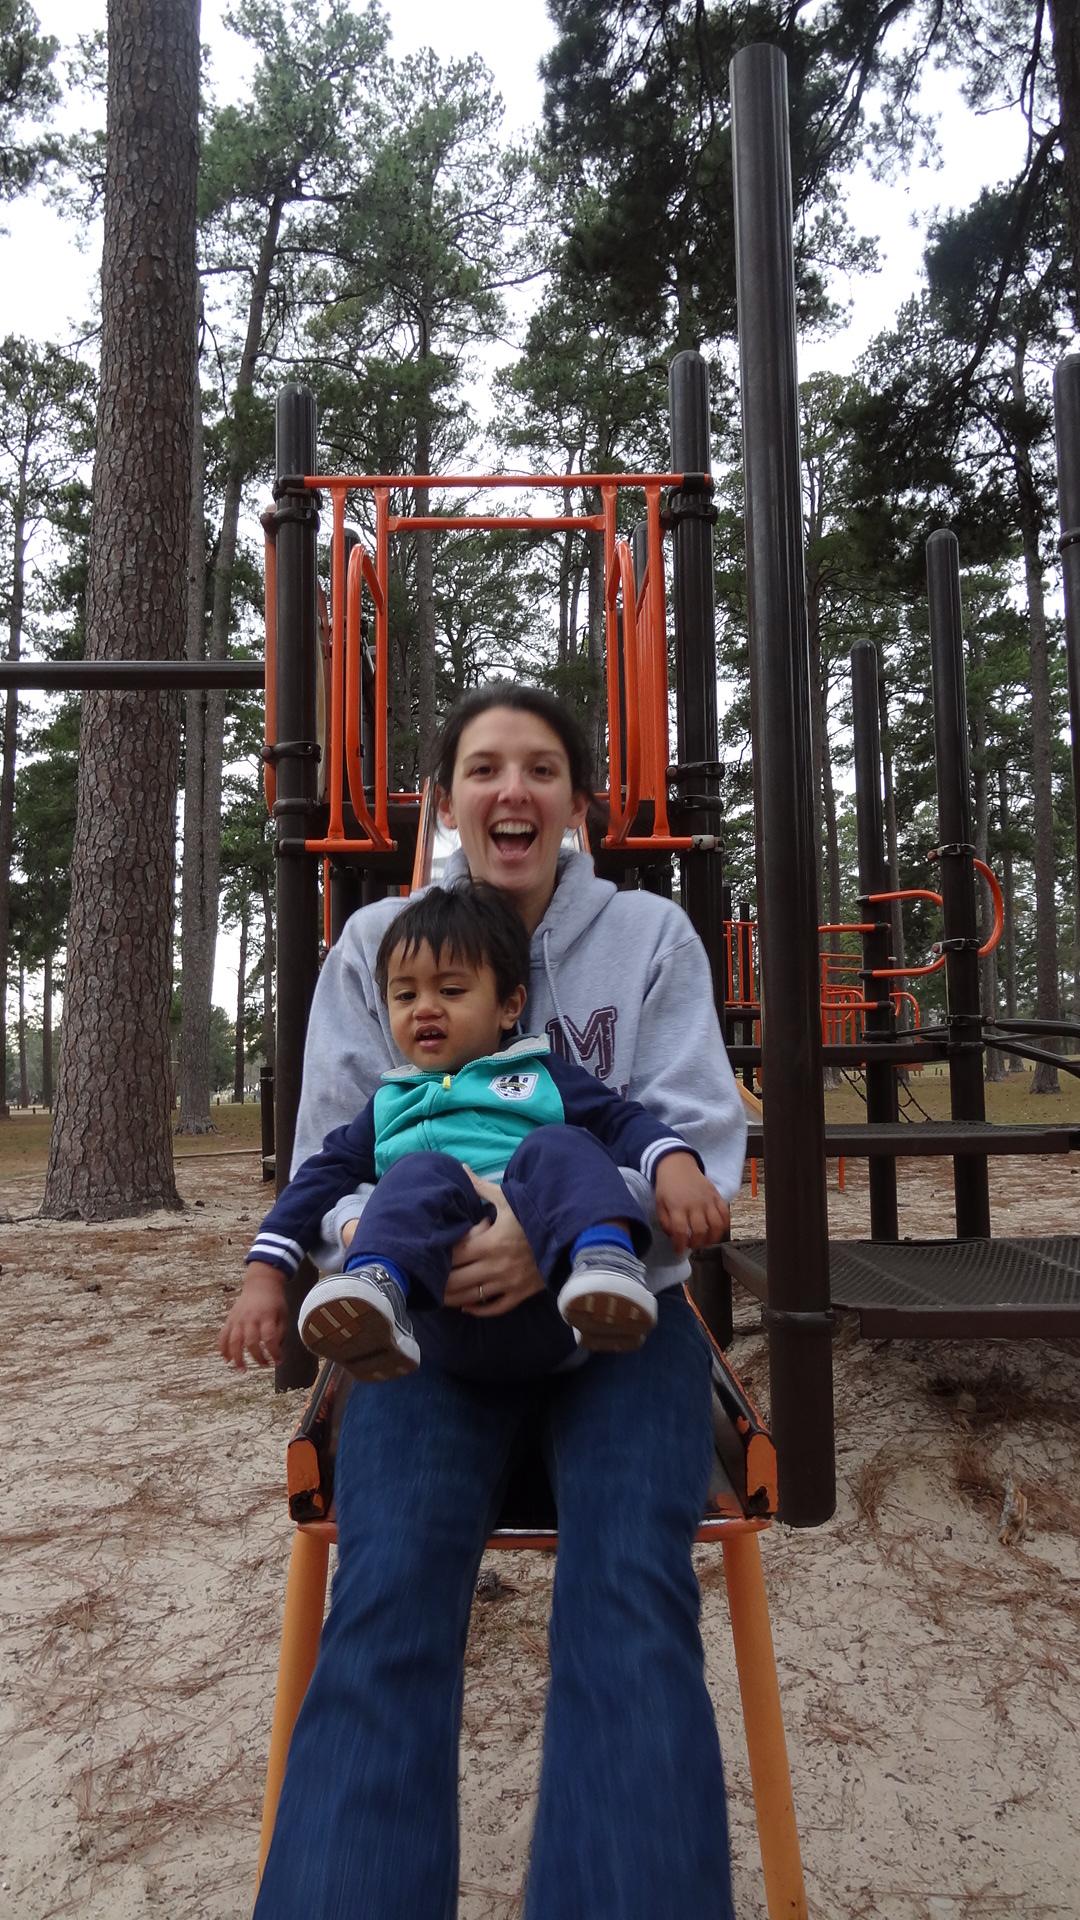 POTW Family - Playground